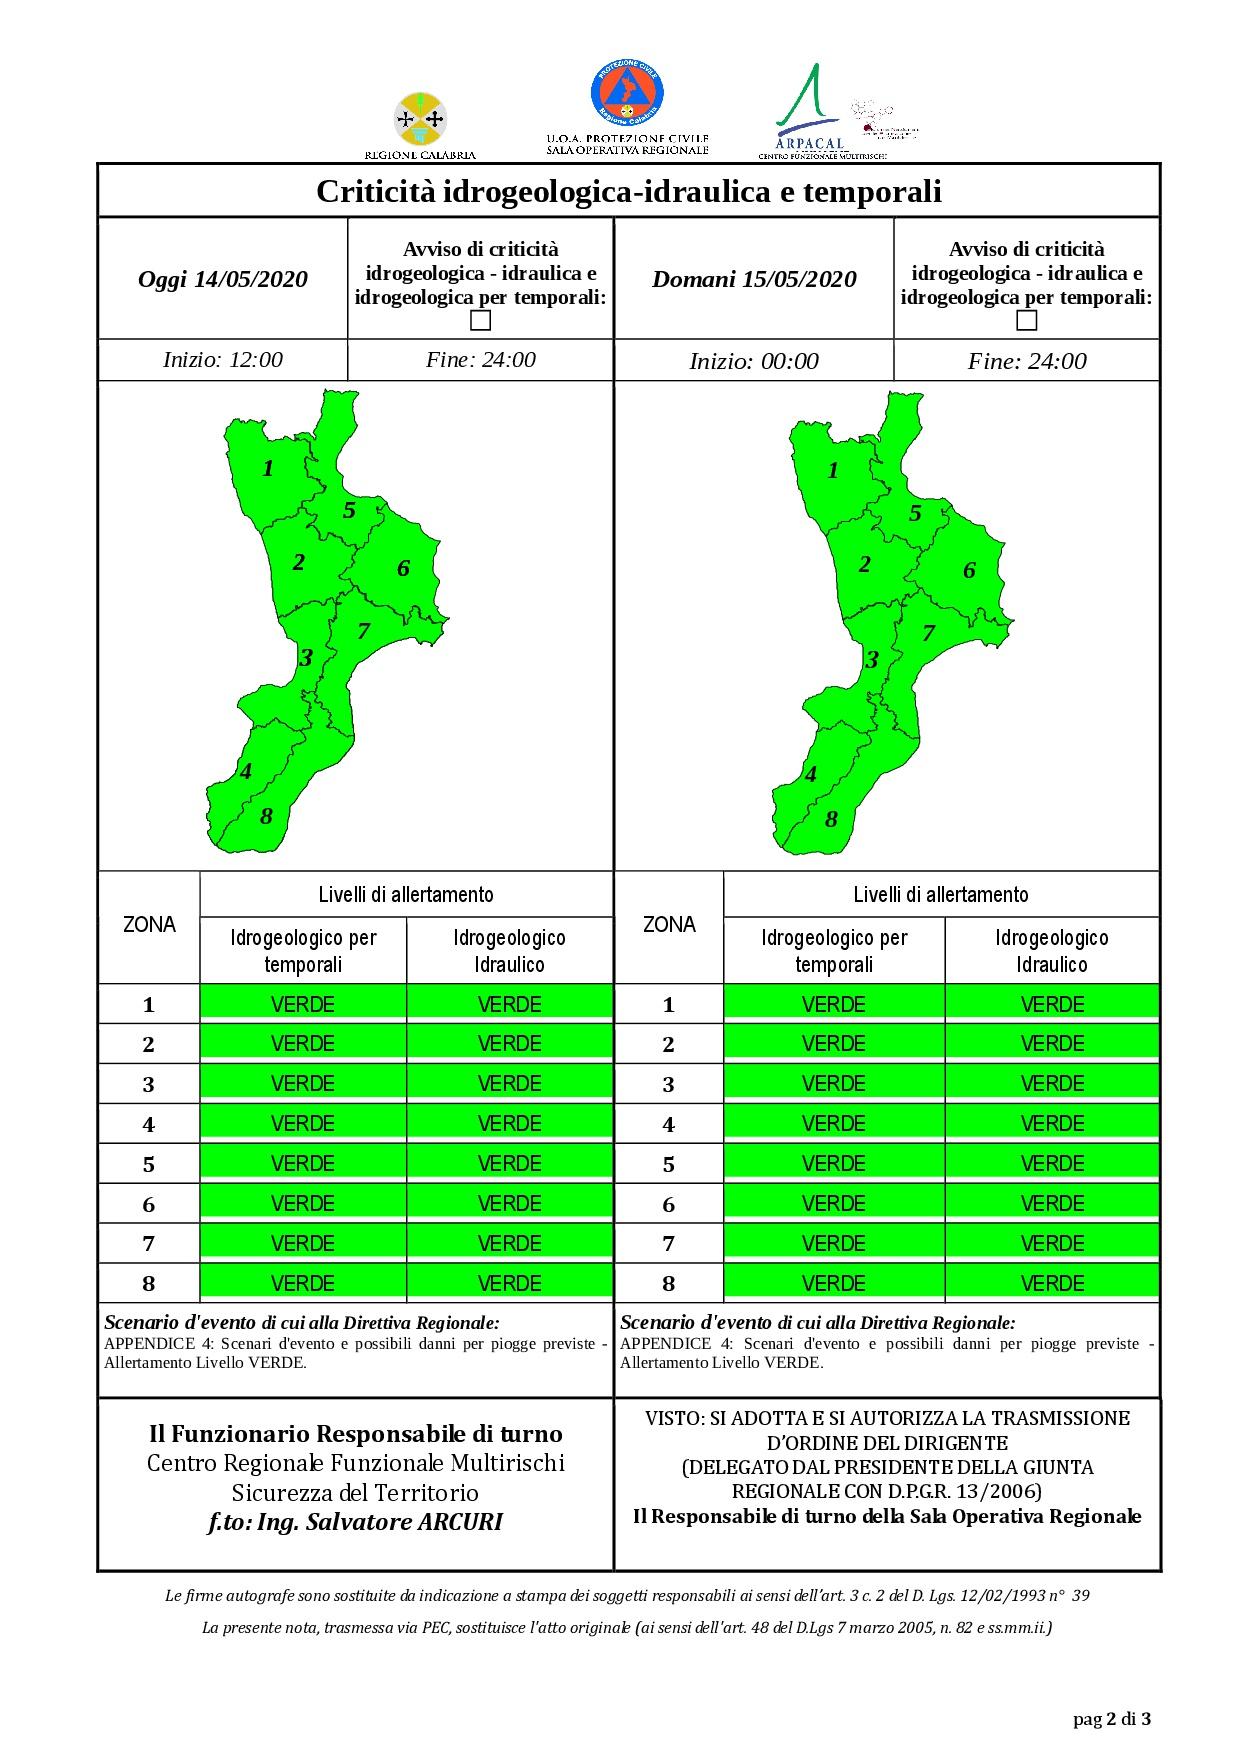 Criticità idrogeologica-idraulica e temporali in Calabria 14-05-2020